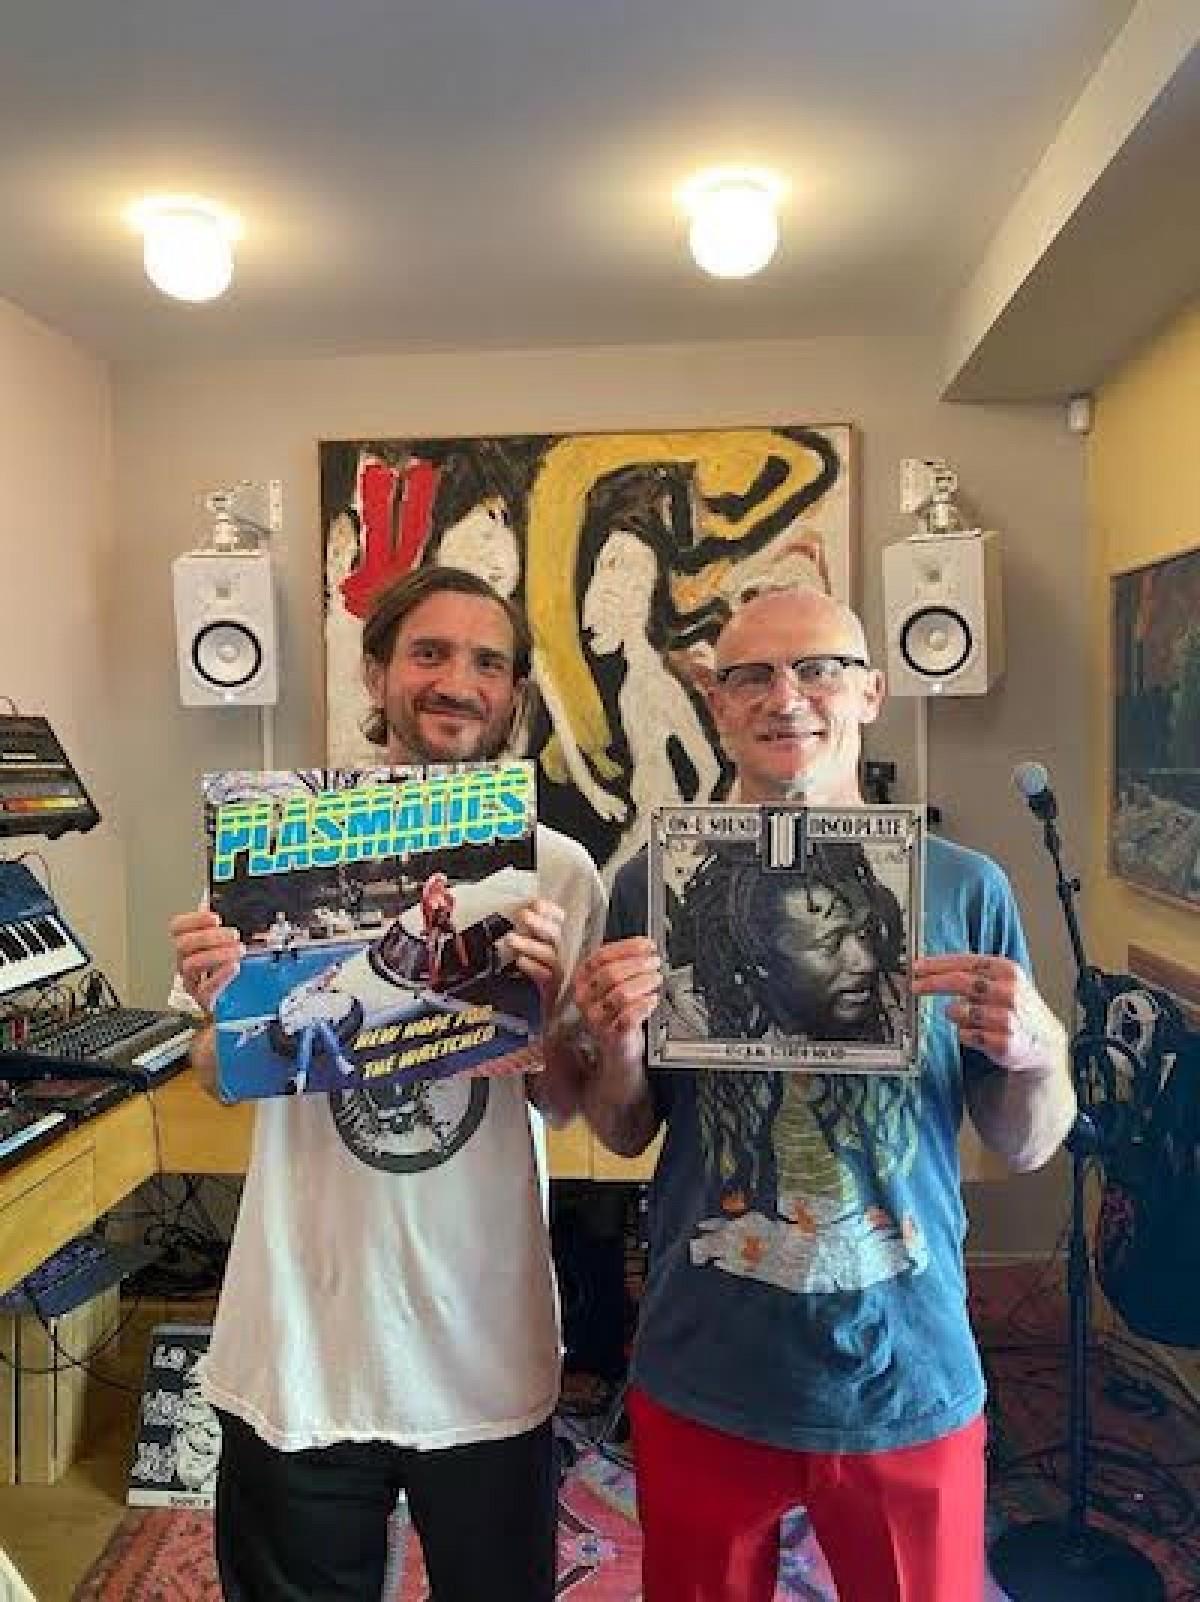 Flea and John Frusciante — Forming Records (05.23.20)